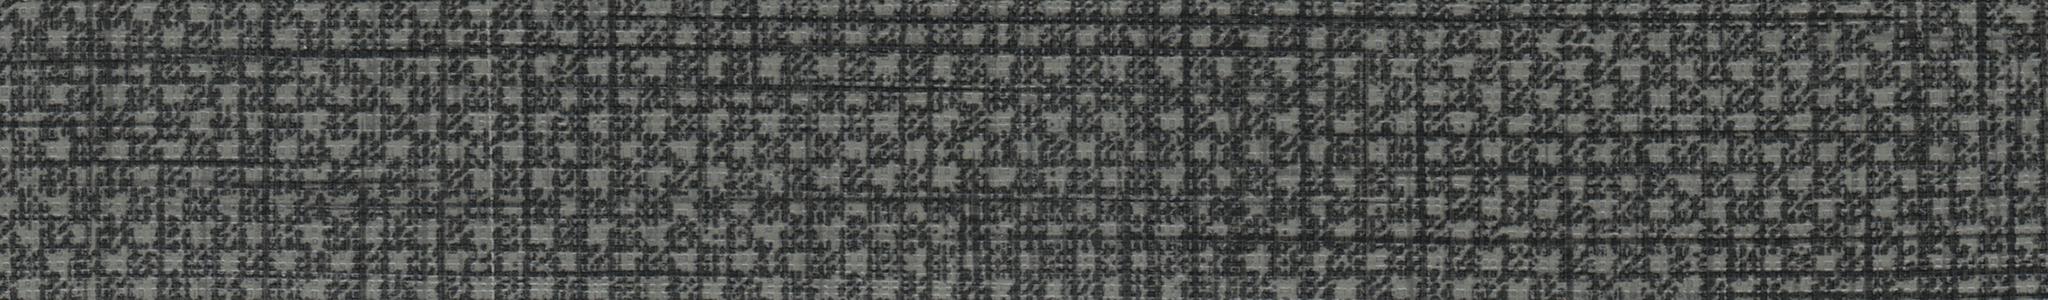 HD 292287 ABS hrana pytlovina tmavá gravír